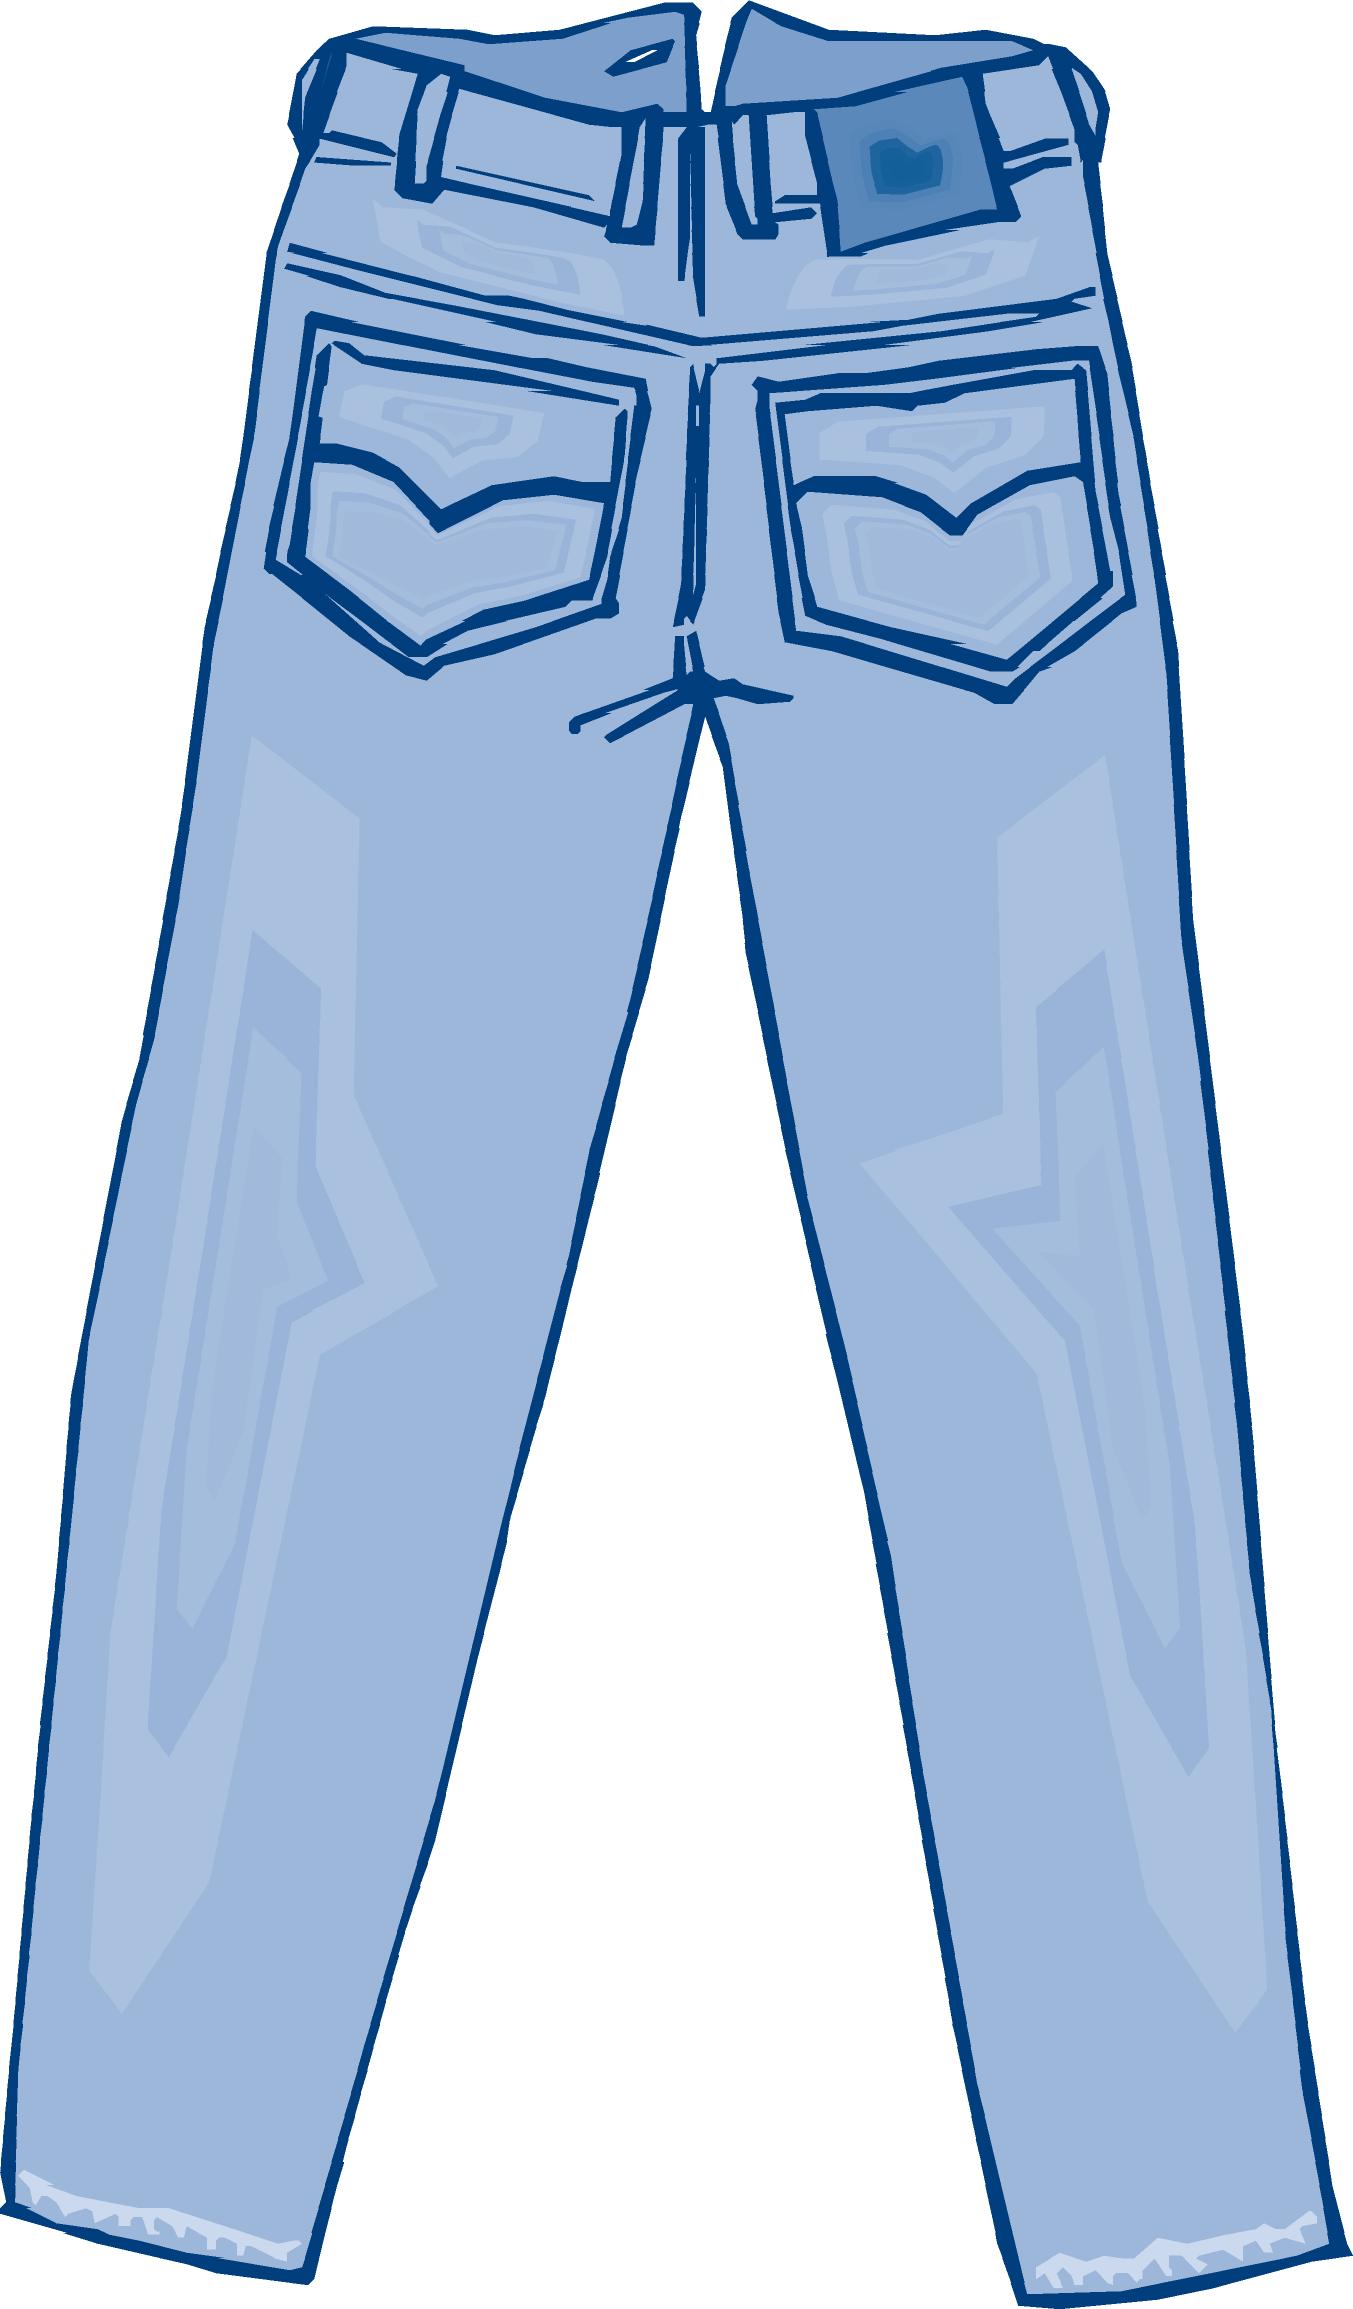 Pants pocket clipart clip library download El blue jean - blue jeans | Hombre de vocabulario | Jeans ... clip library download